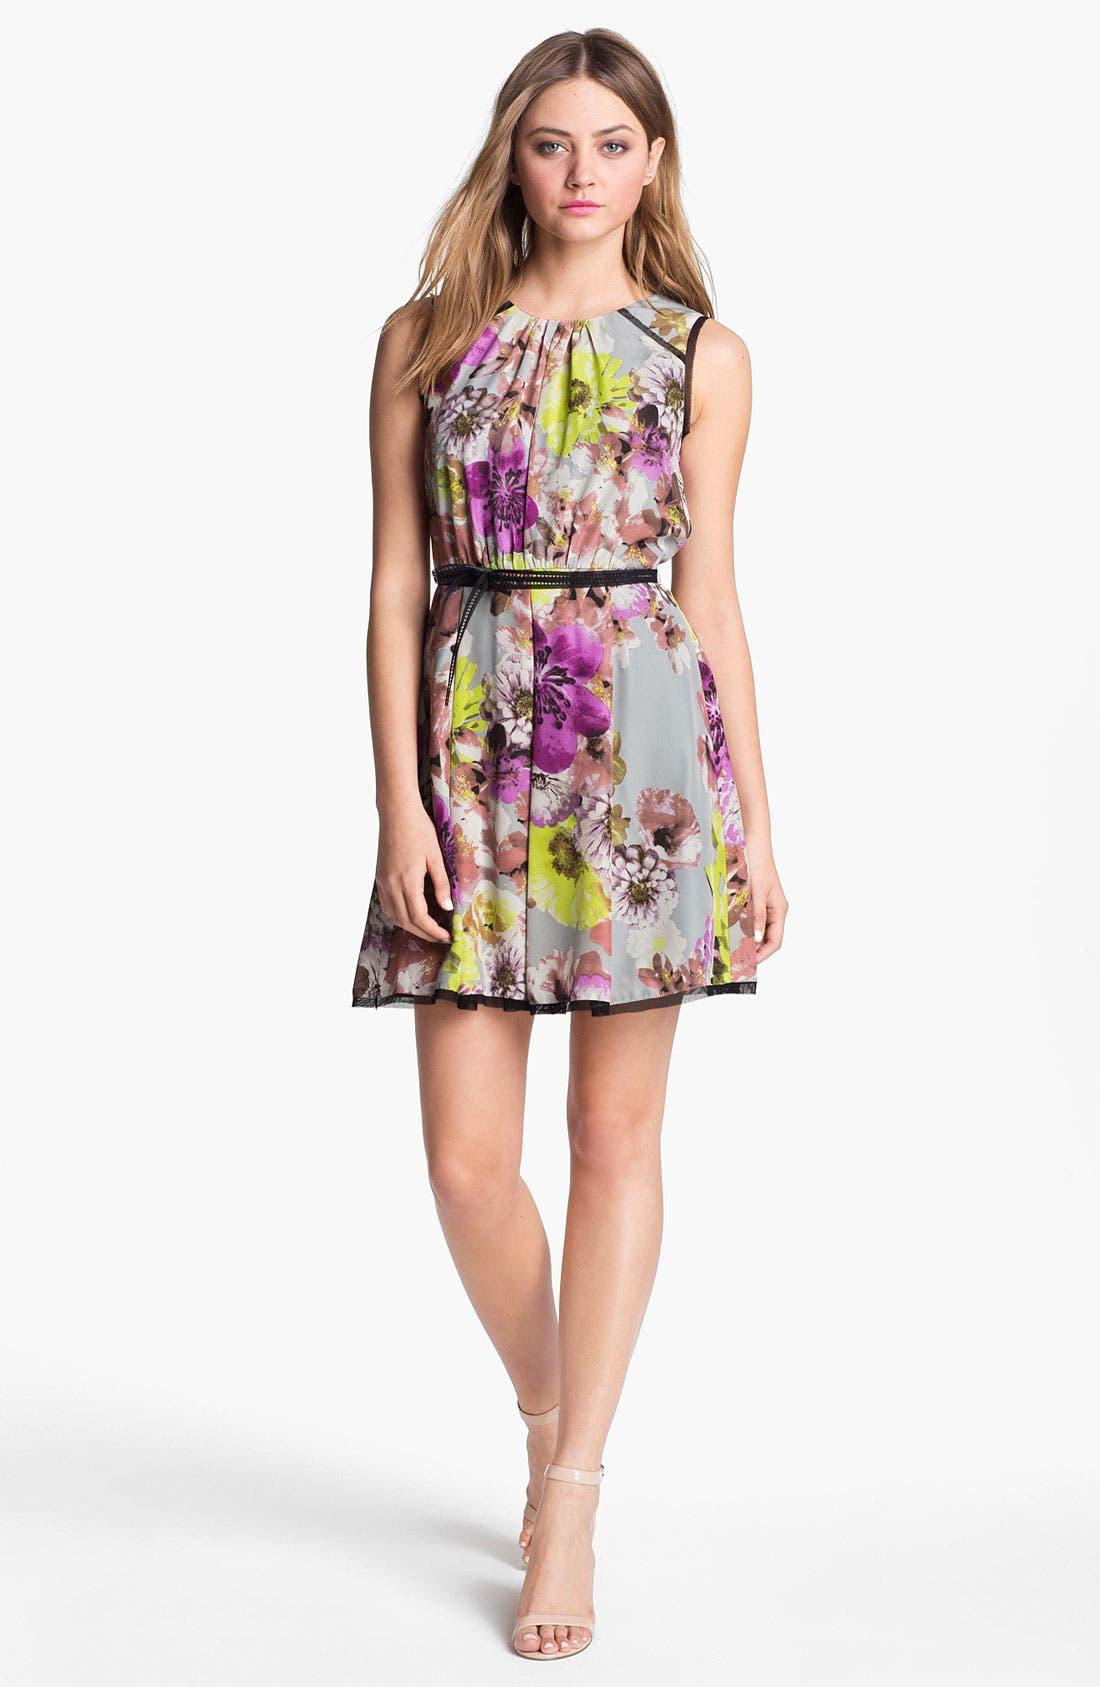 Alternate Image 1 Selected - LABEL by five twelve Floral Print Fit & Flare Dress